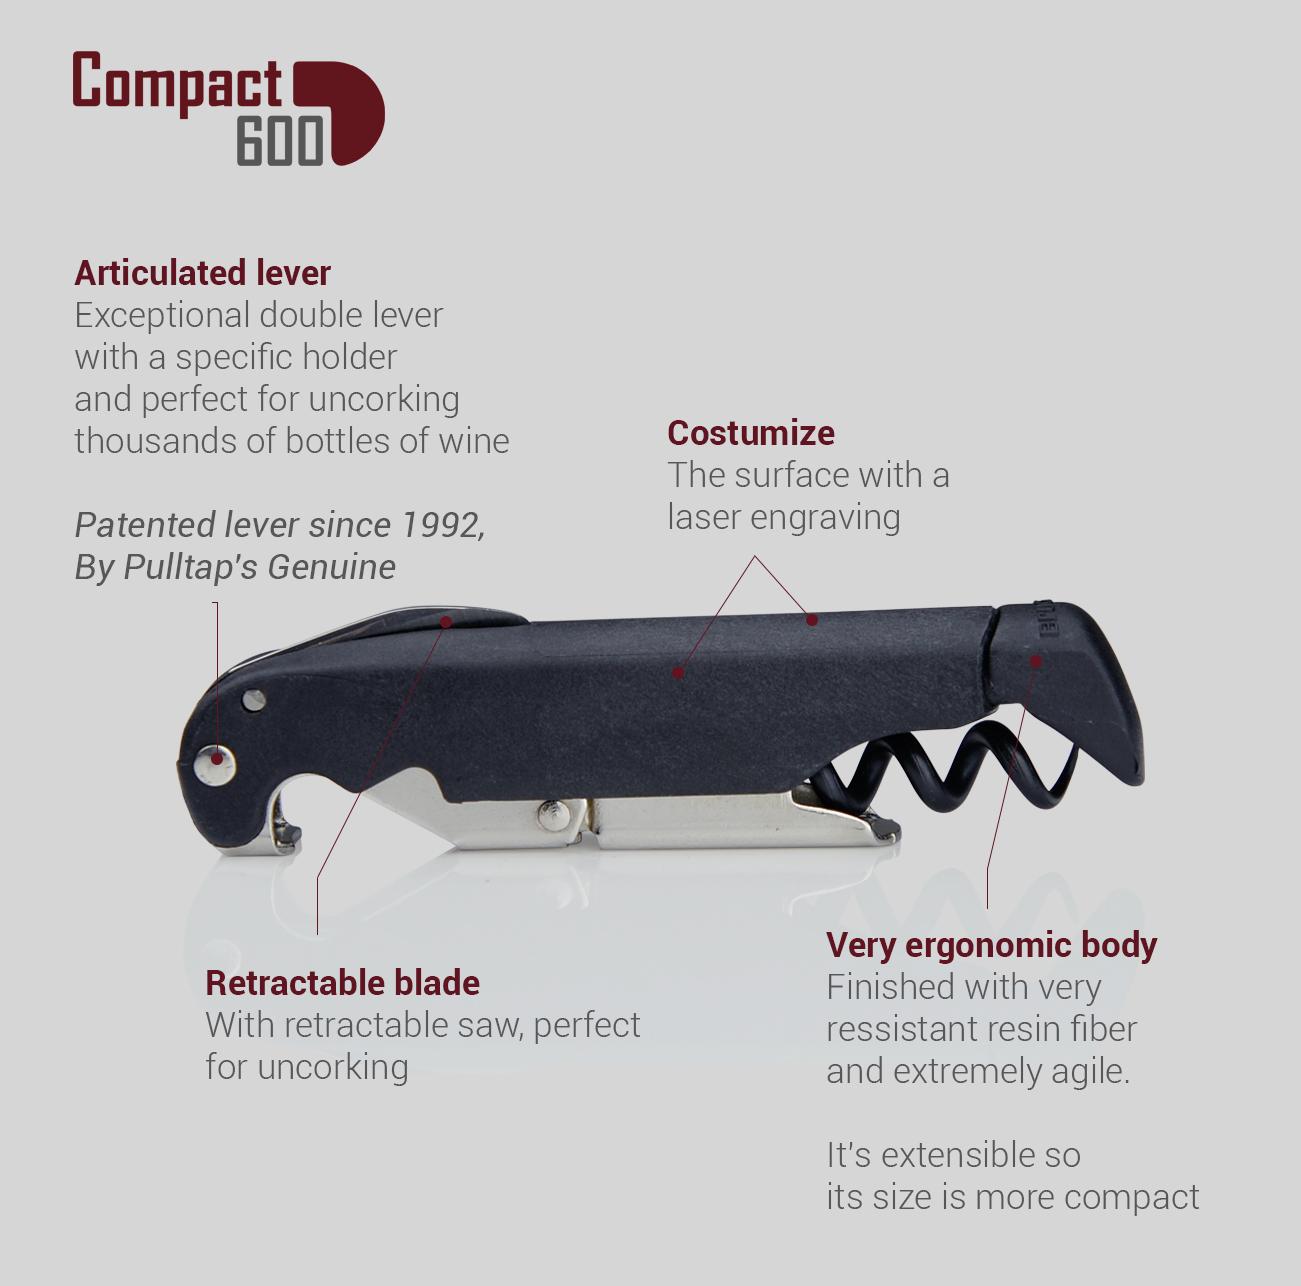 Compact 600